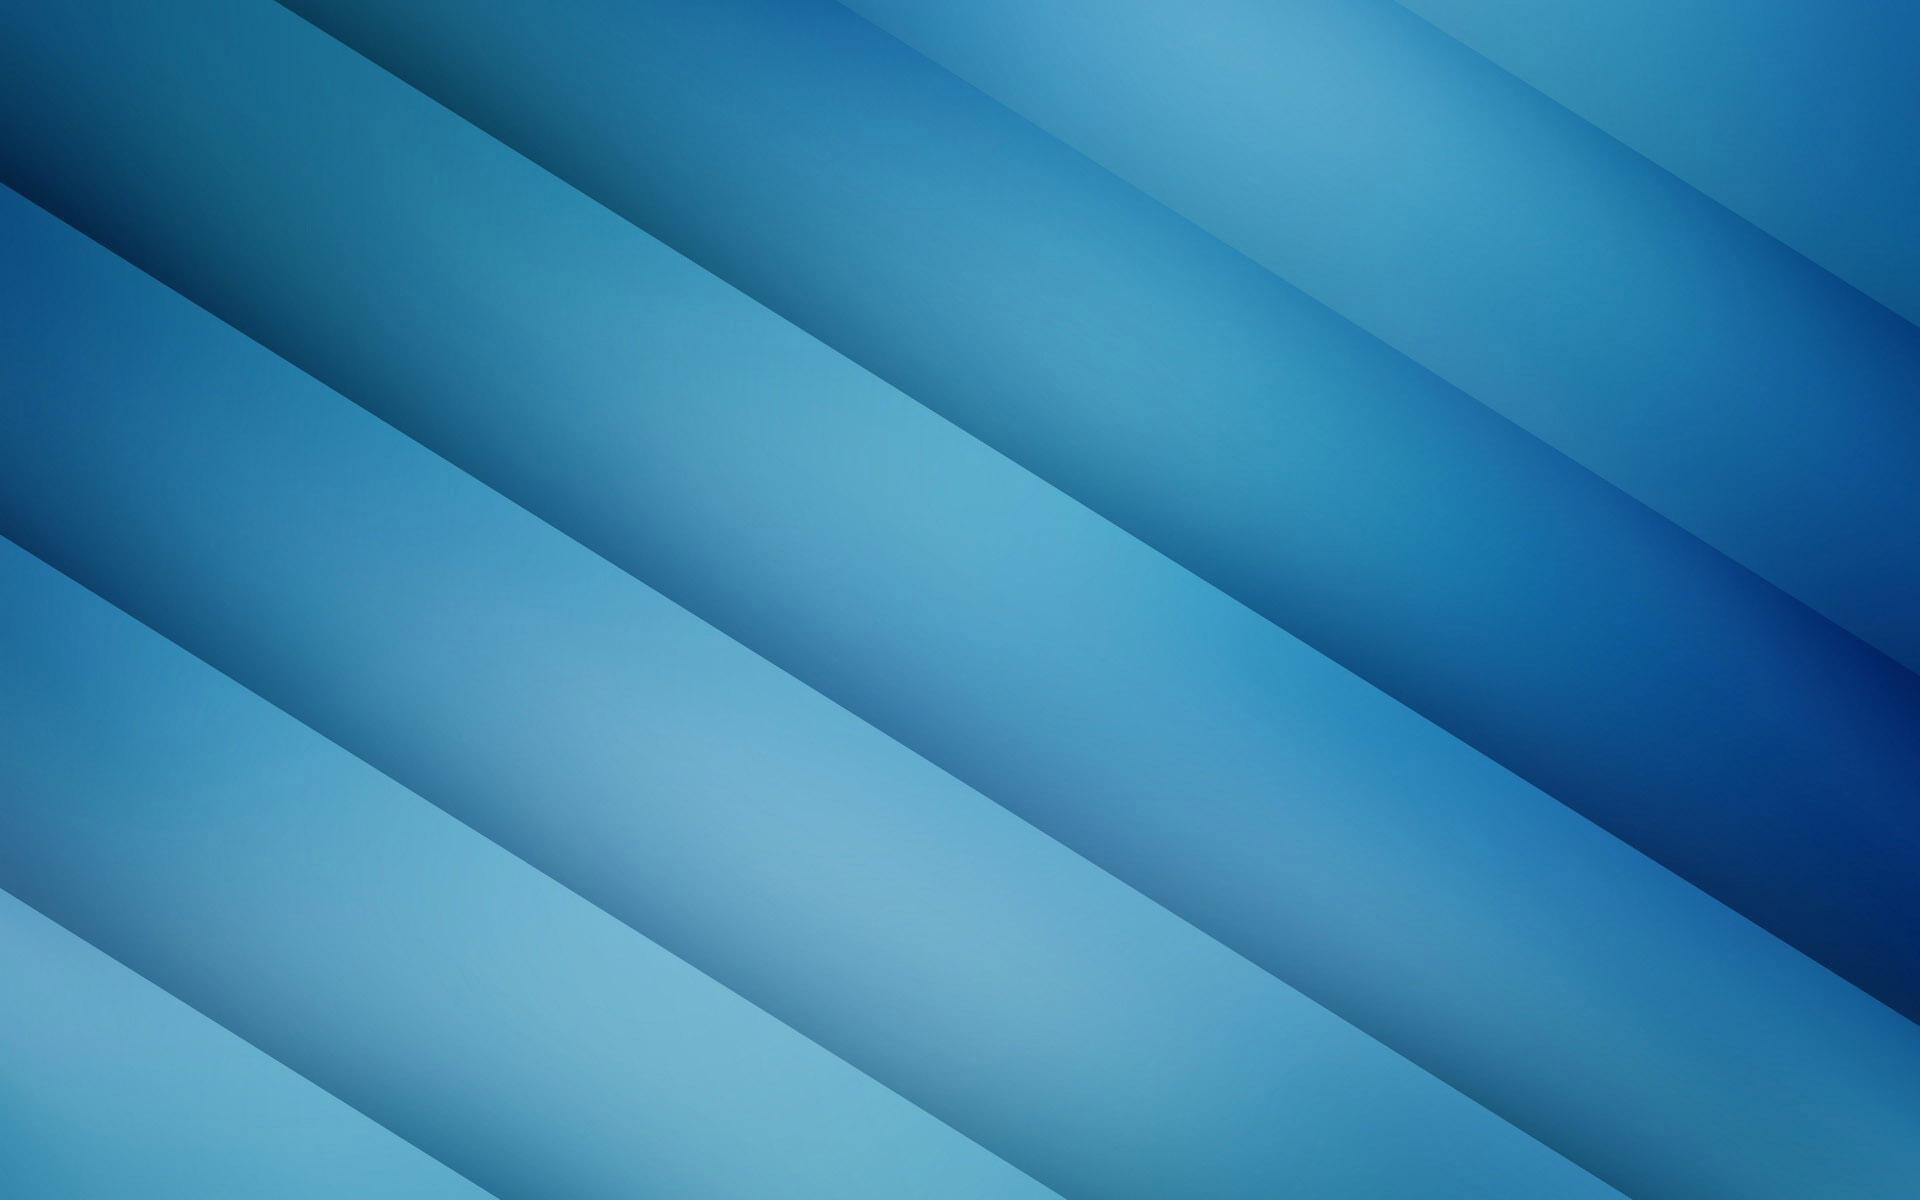 Vright-wallpaper-backgroundshd-wallpapers